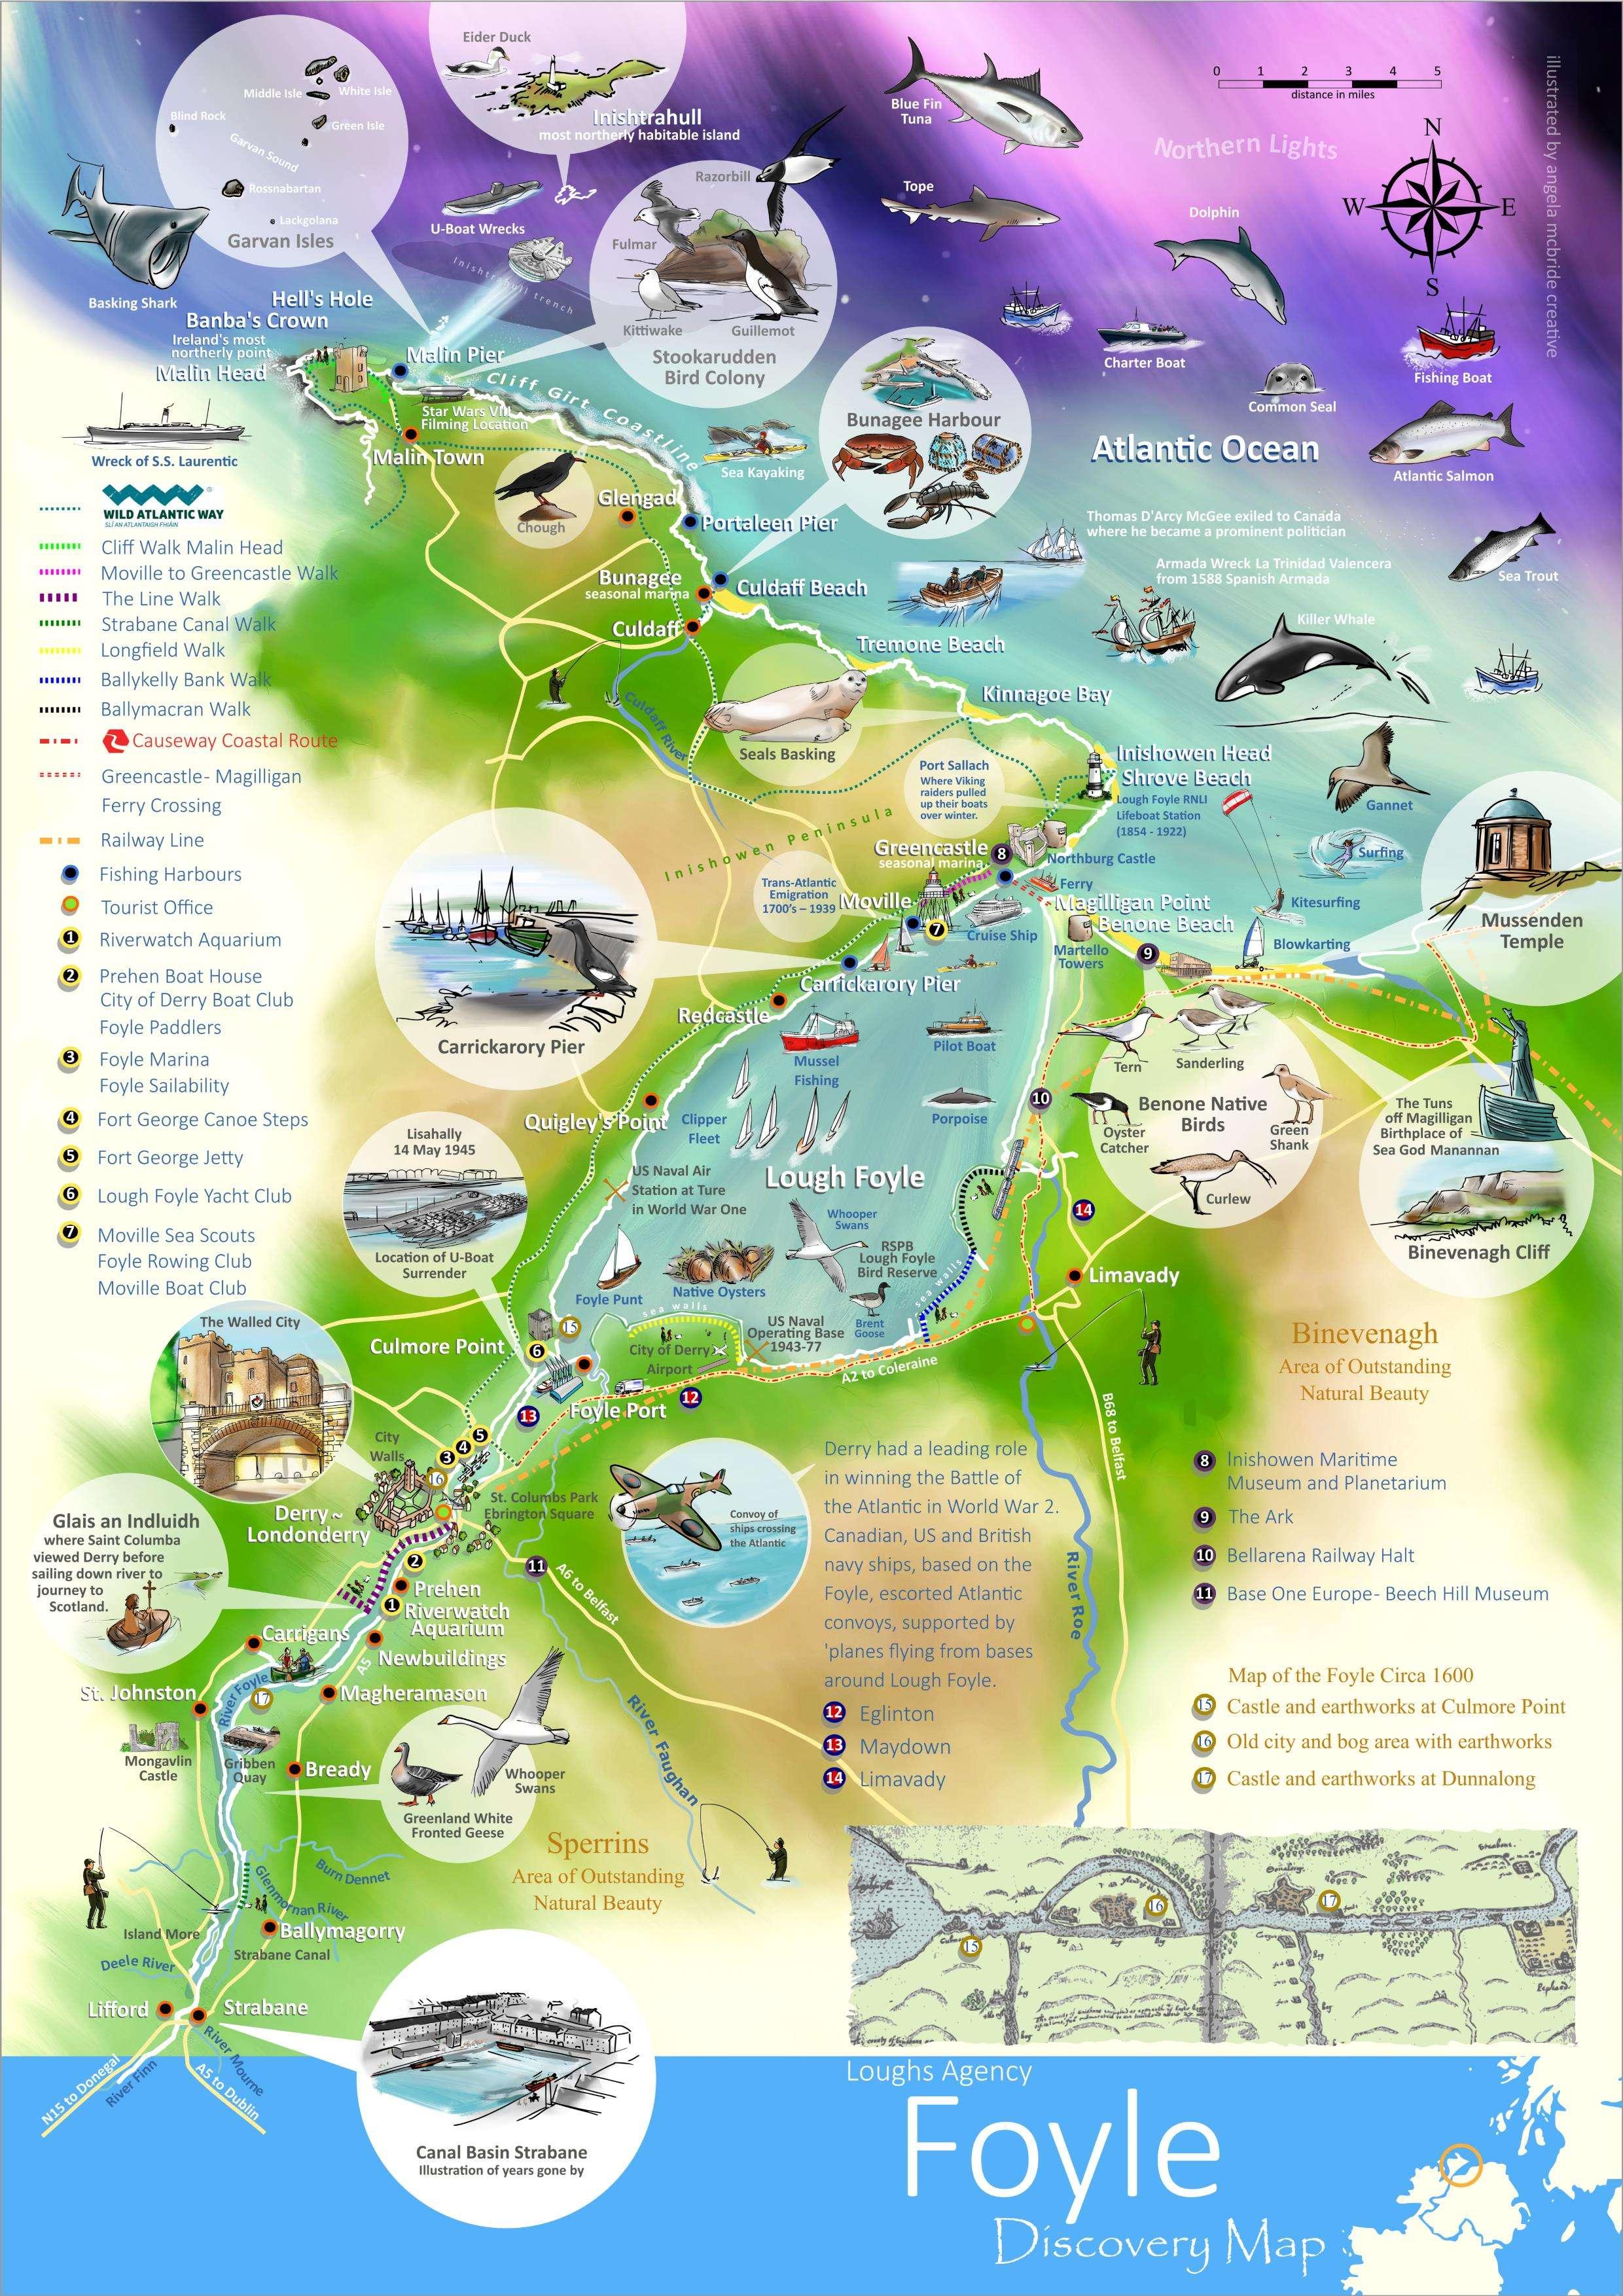 Marine Tourism map of Foyle area